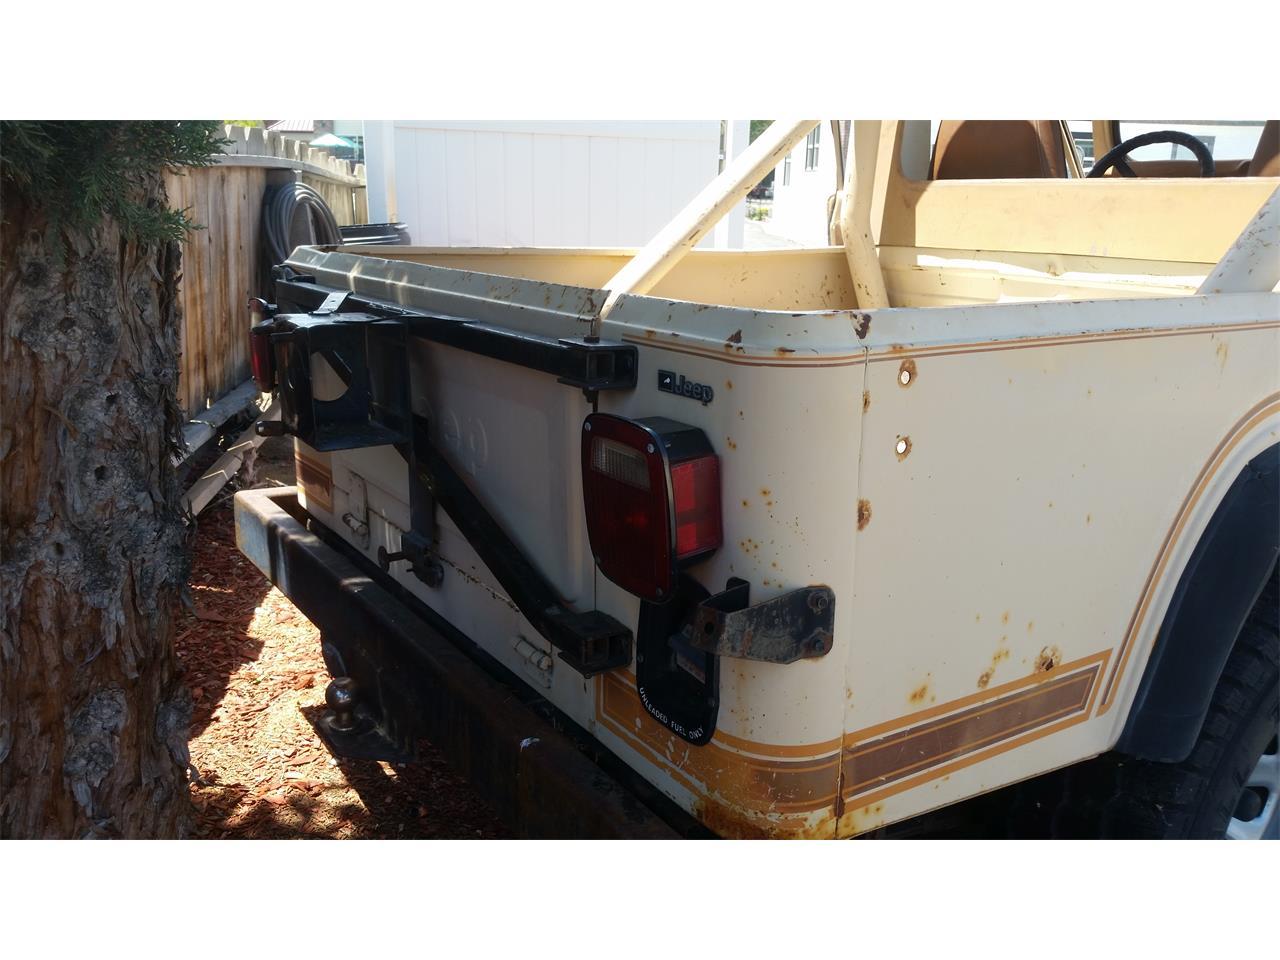 1981 Jeep CJ8 Scrambler (CC-1359553) for sale in Gardnerville, Nevada